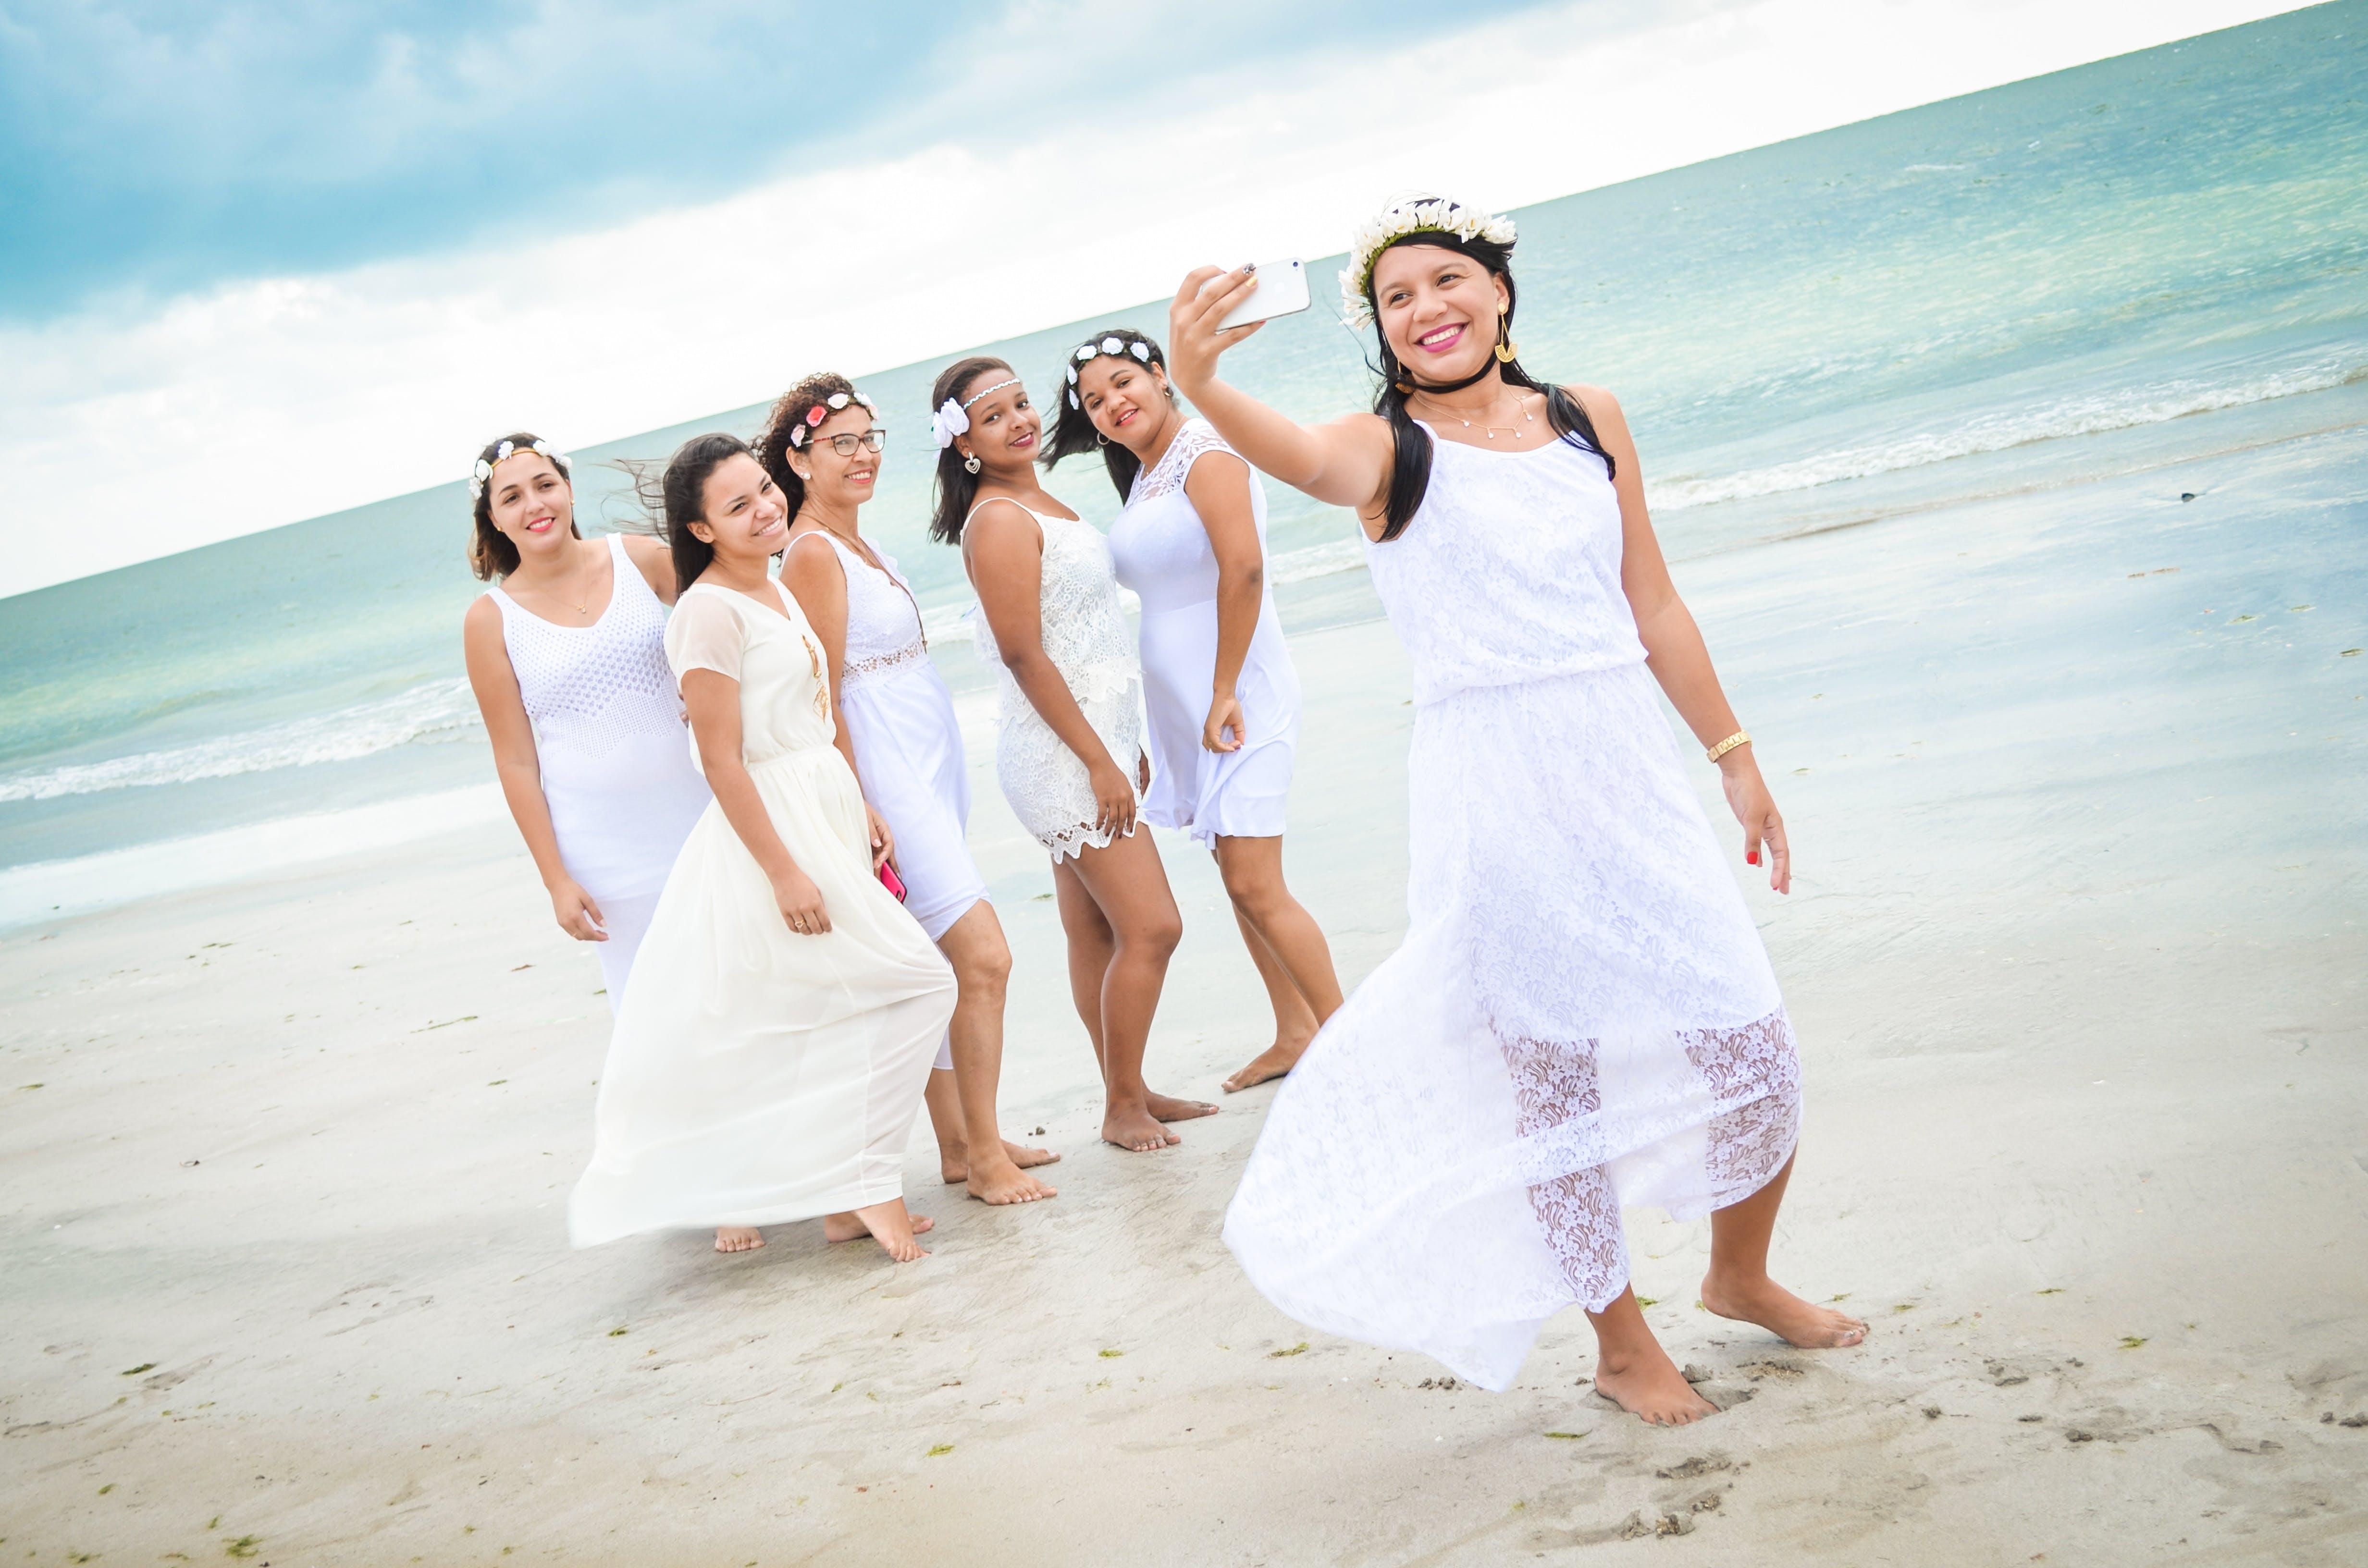 Six Women Taking Photo on Seashore